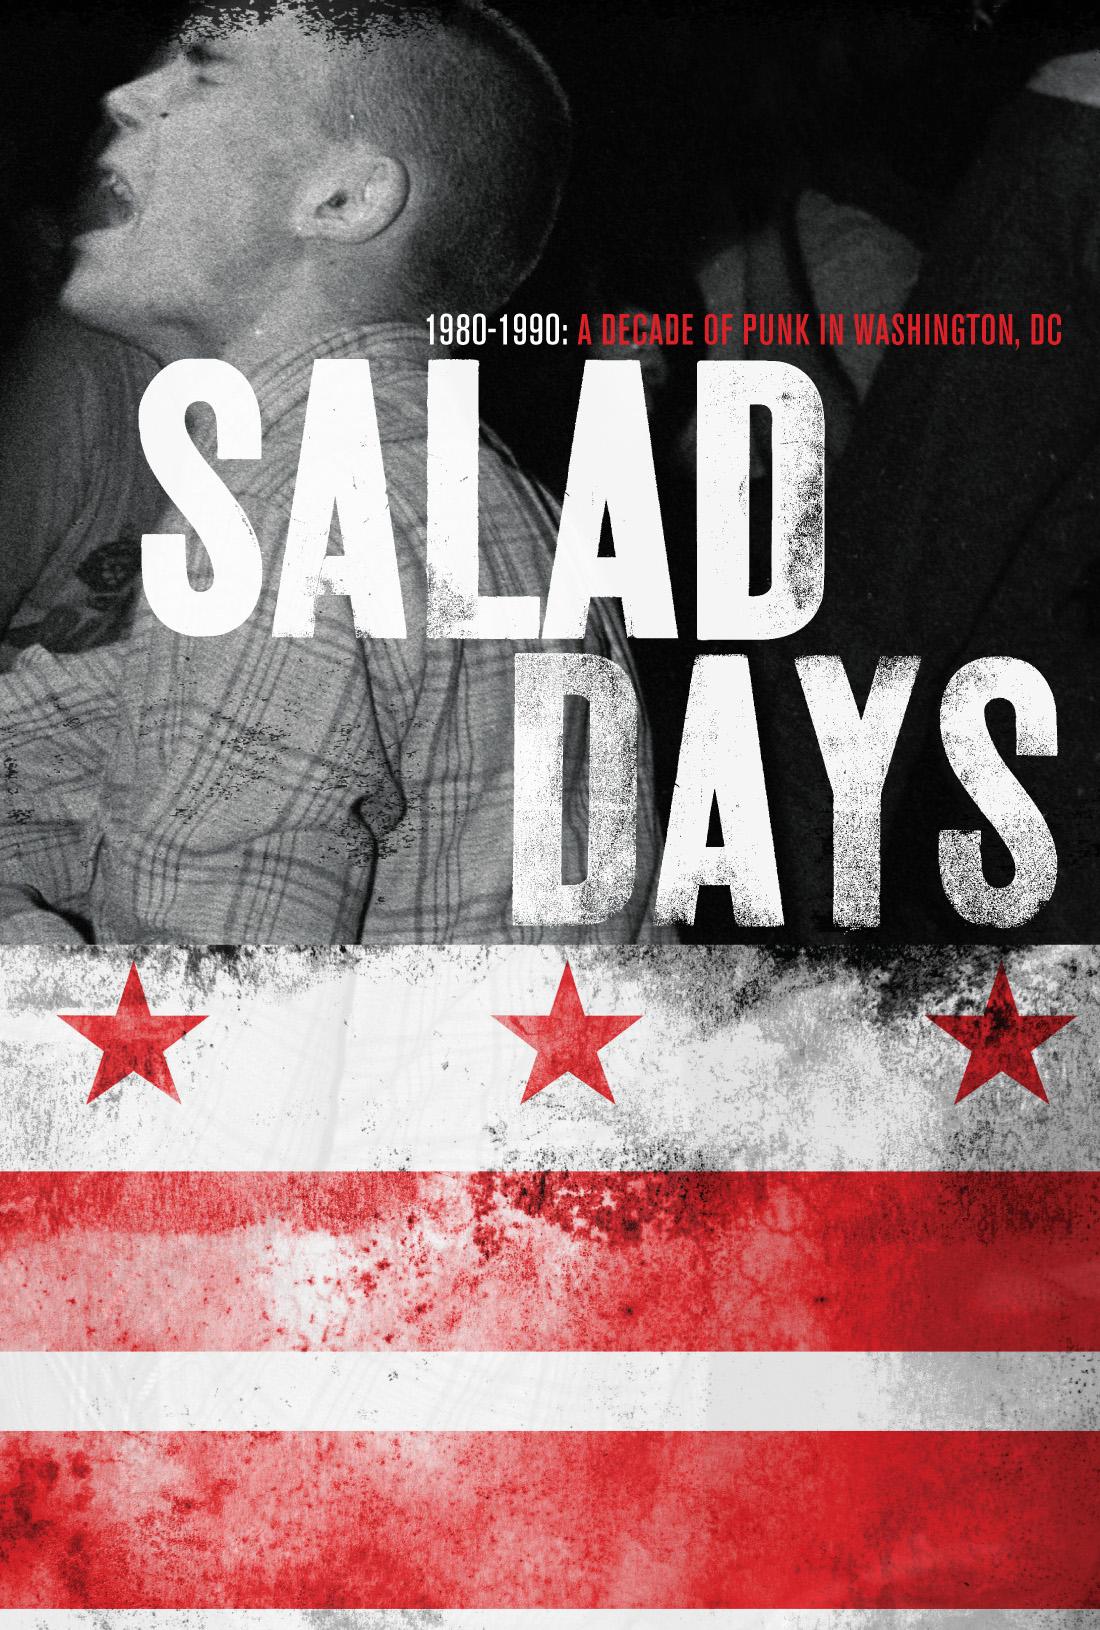 SALAD DAYS: THE DC PUNK REVOLUTION